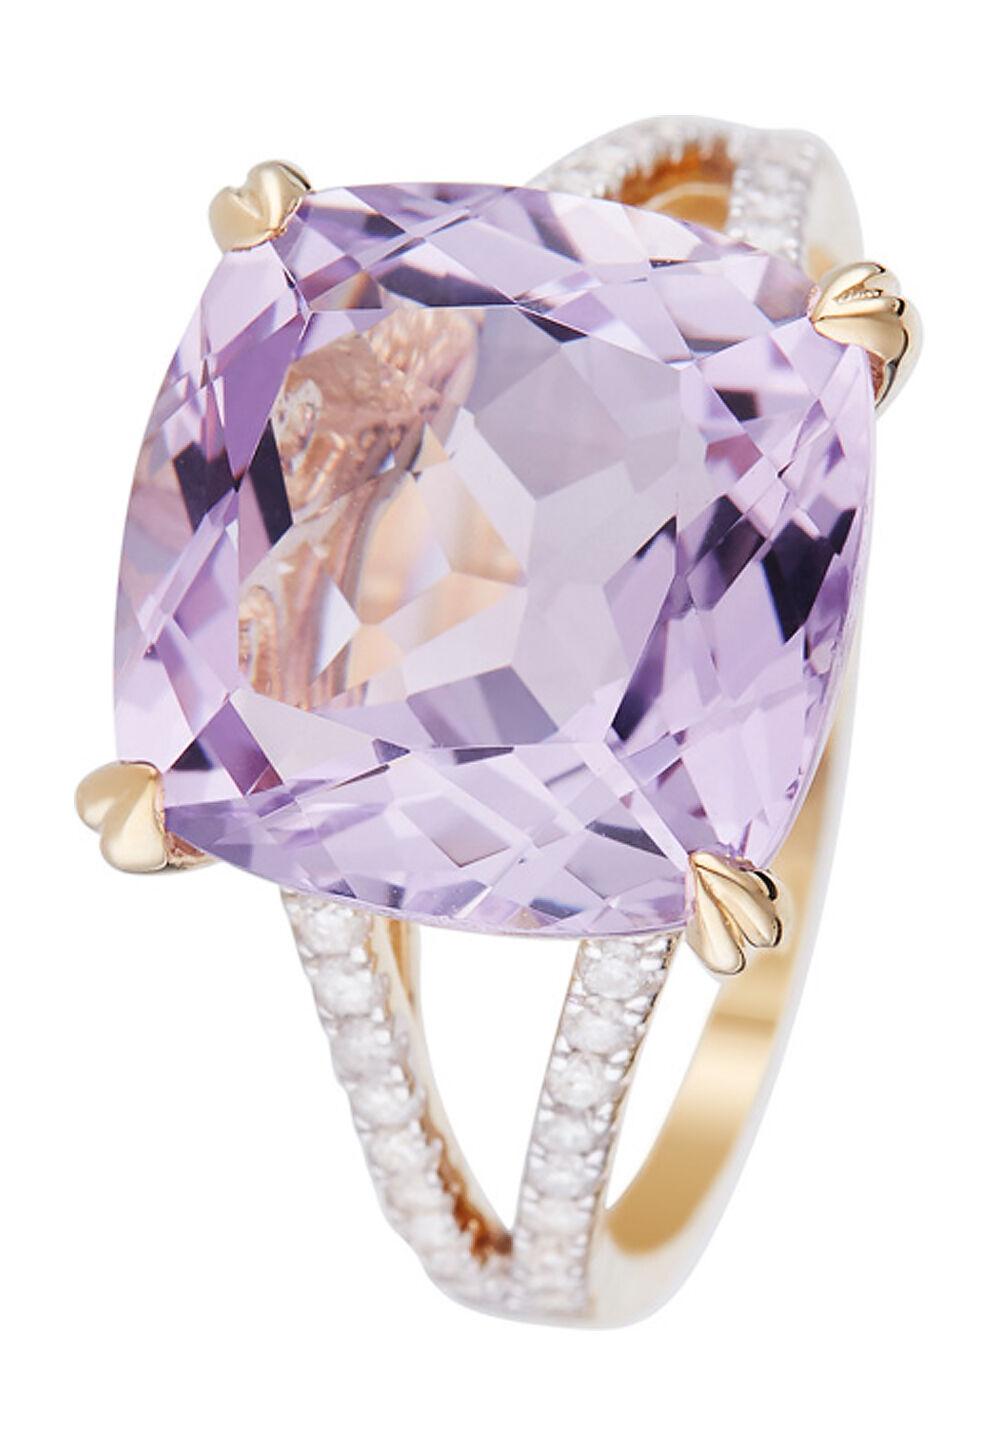 Diamond CO Ring Pink Fiction, 375 Gelbgold, Diamant/Amethyst